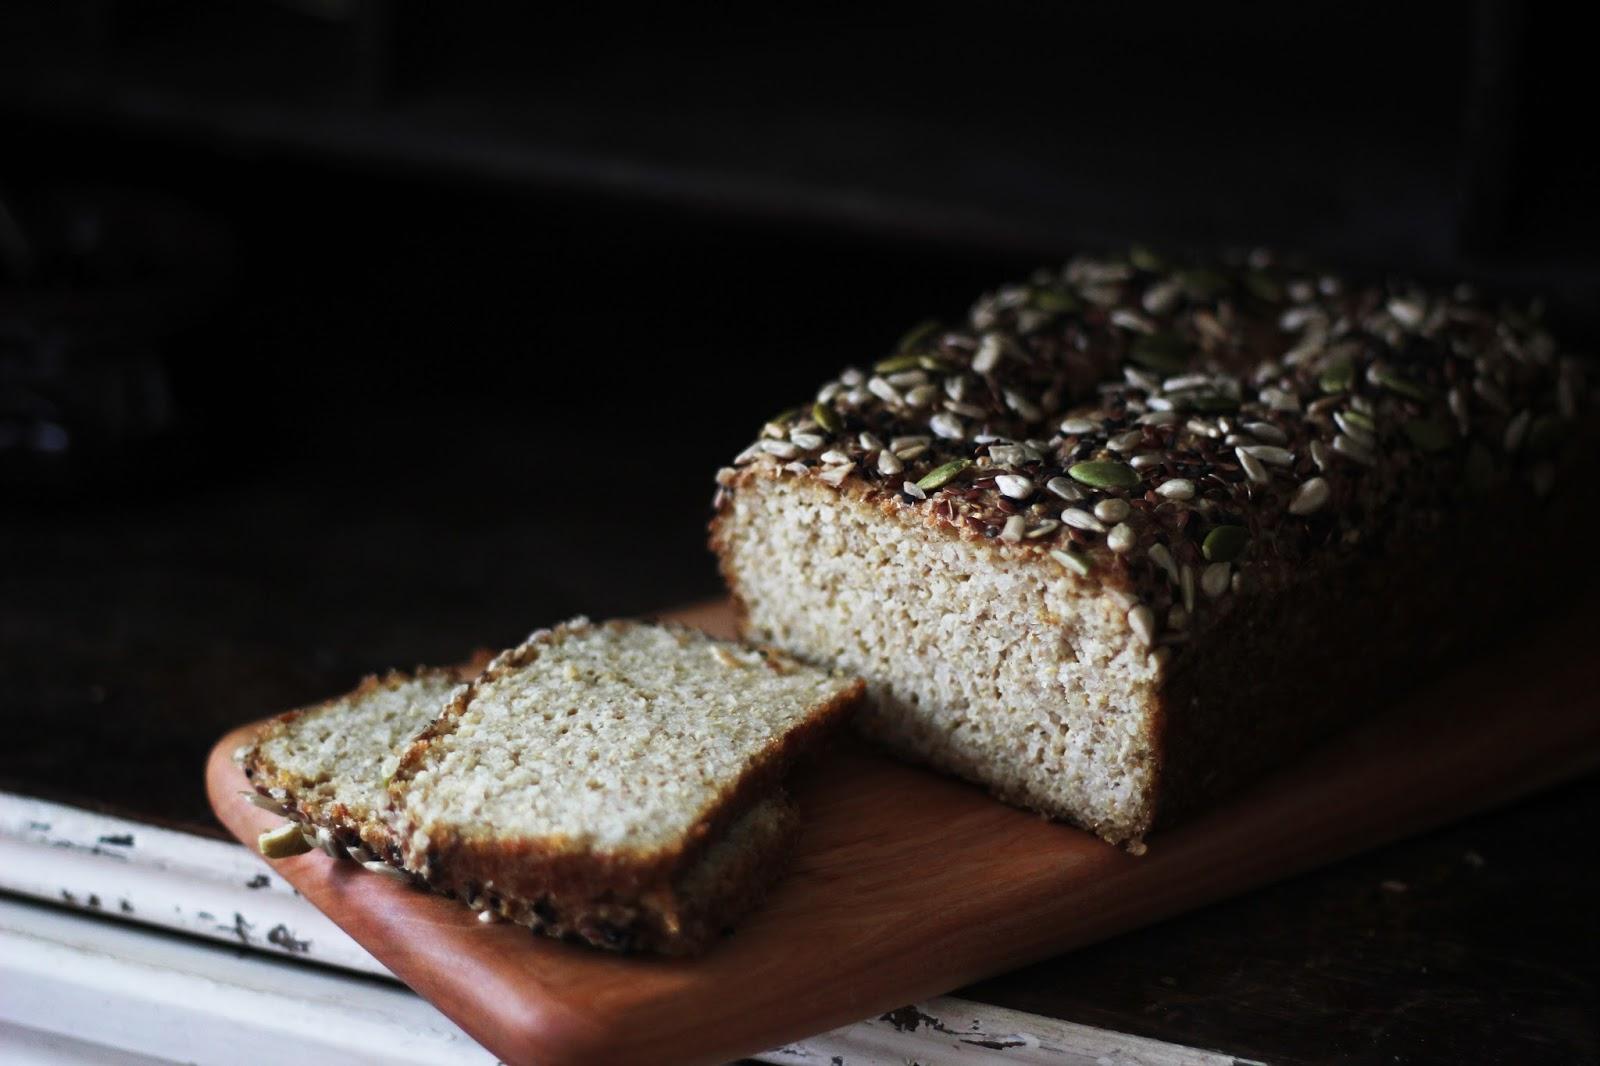 The Unbelievable Bread